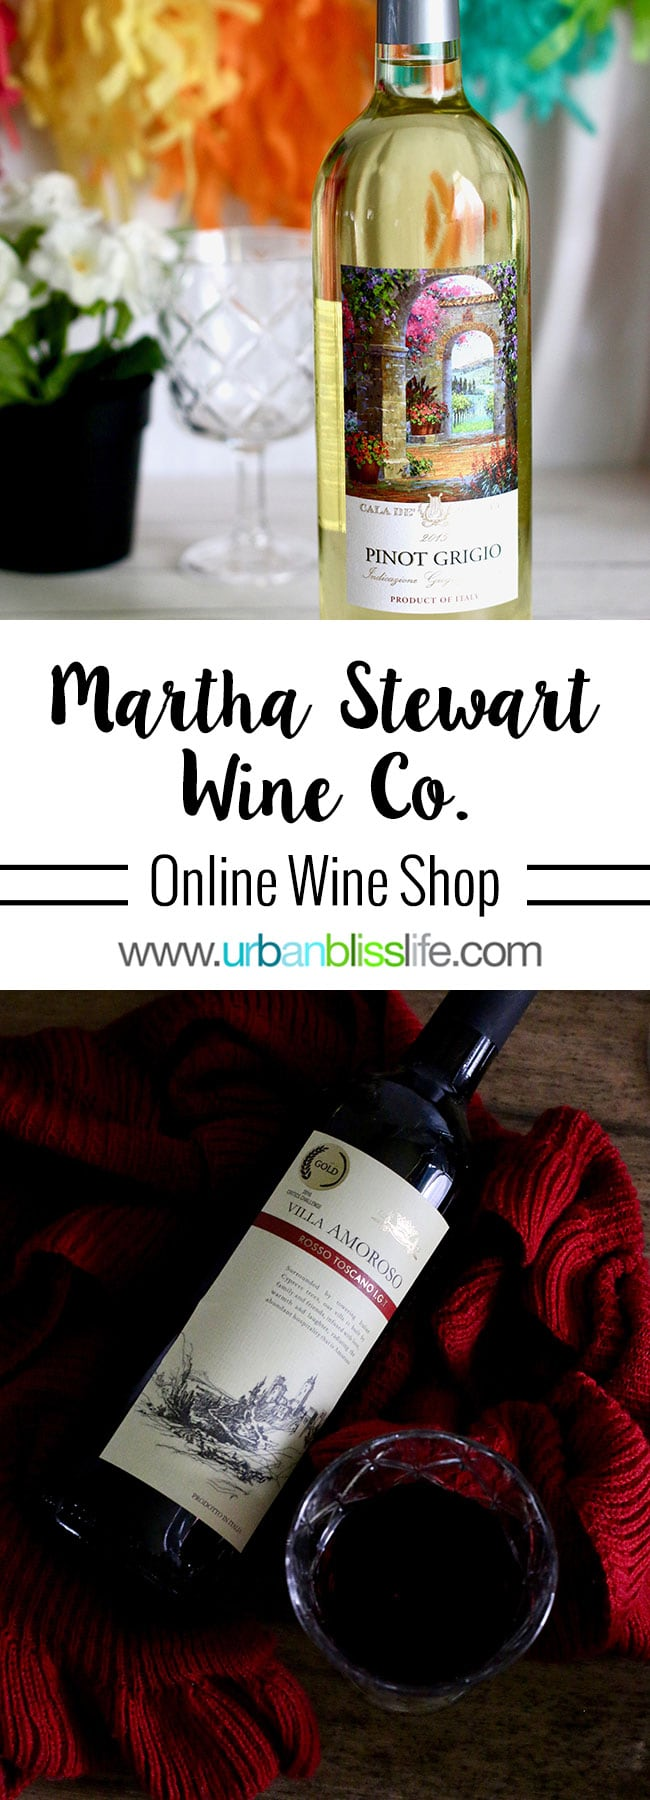 Martha Stewart Wine Co. main photo